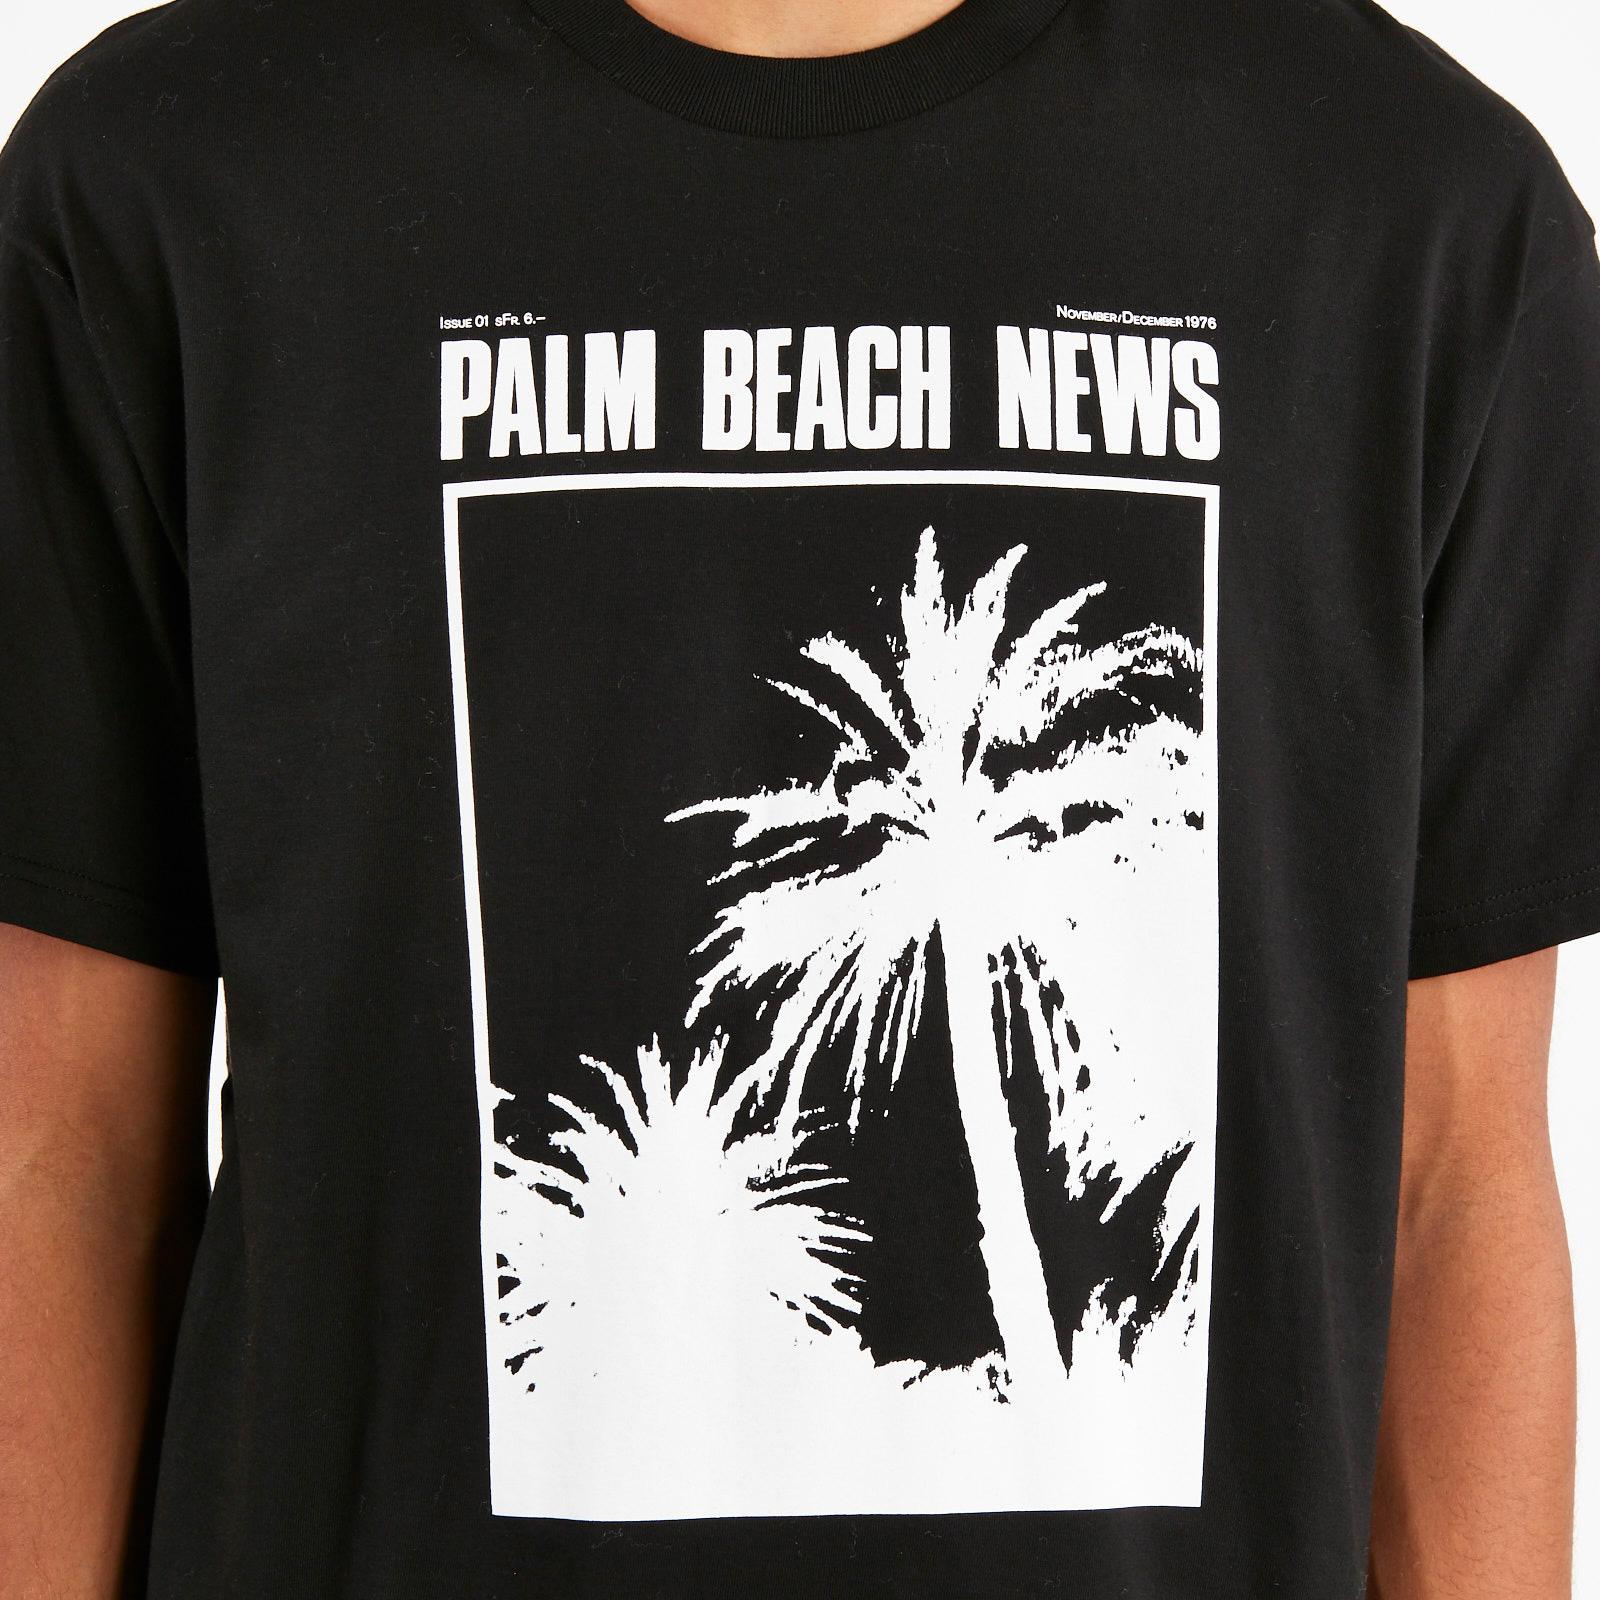 Carhartt SS TVC Palm Beach News I026013.89.90.03